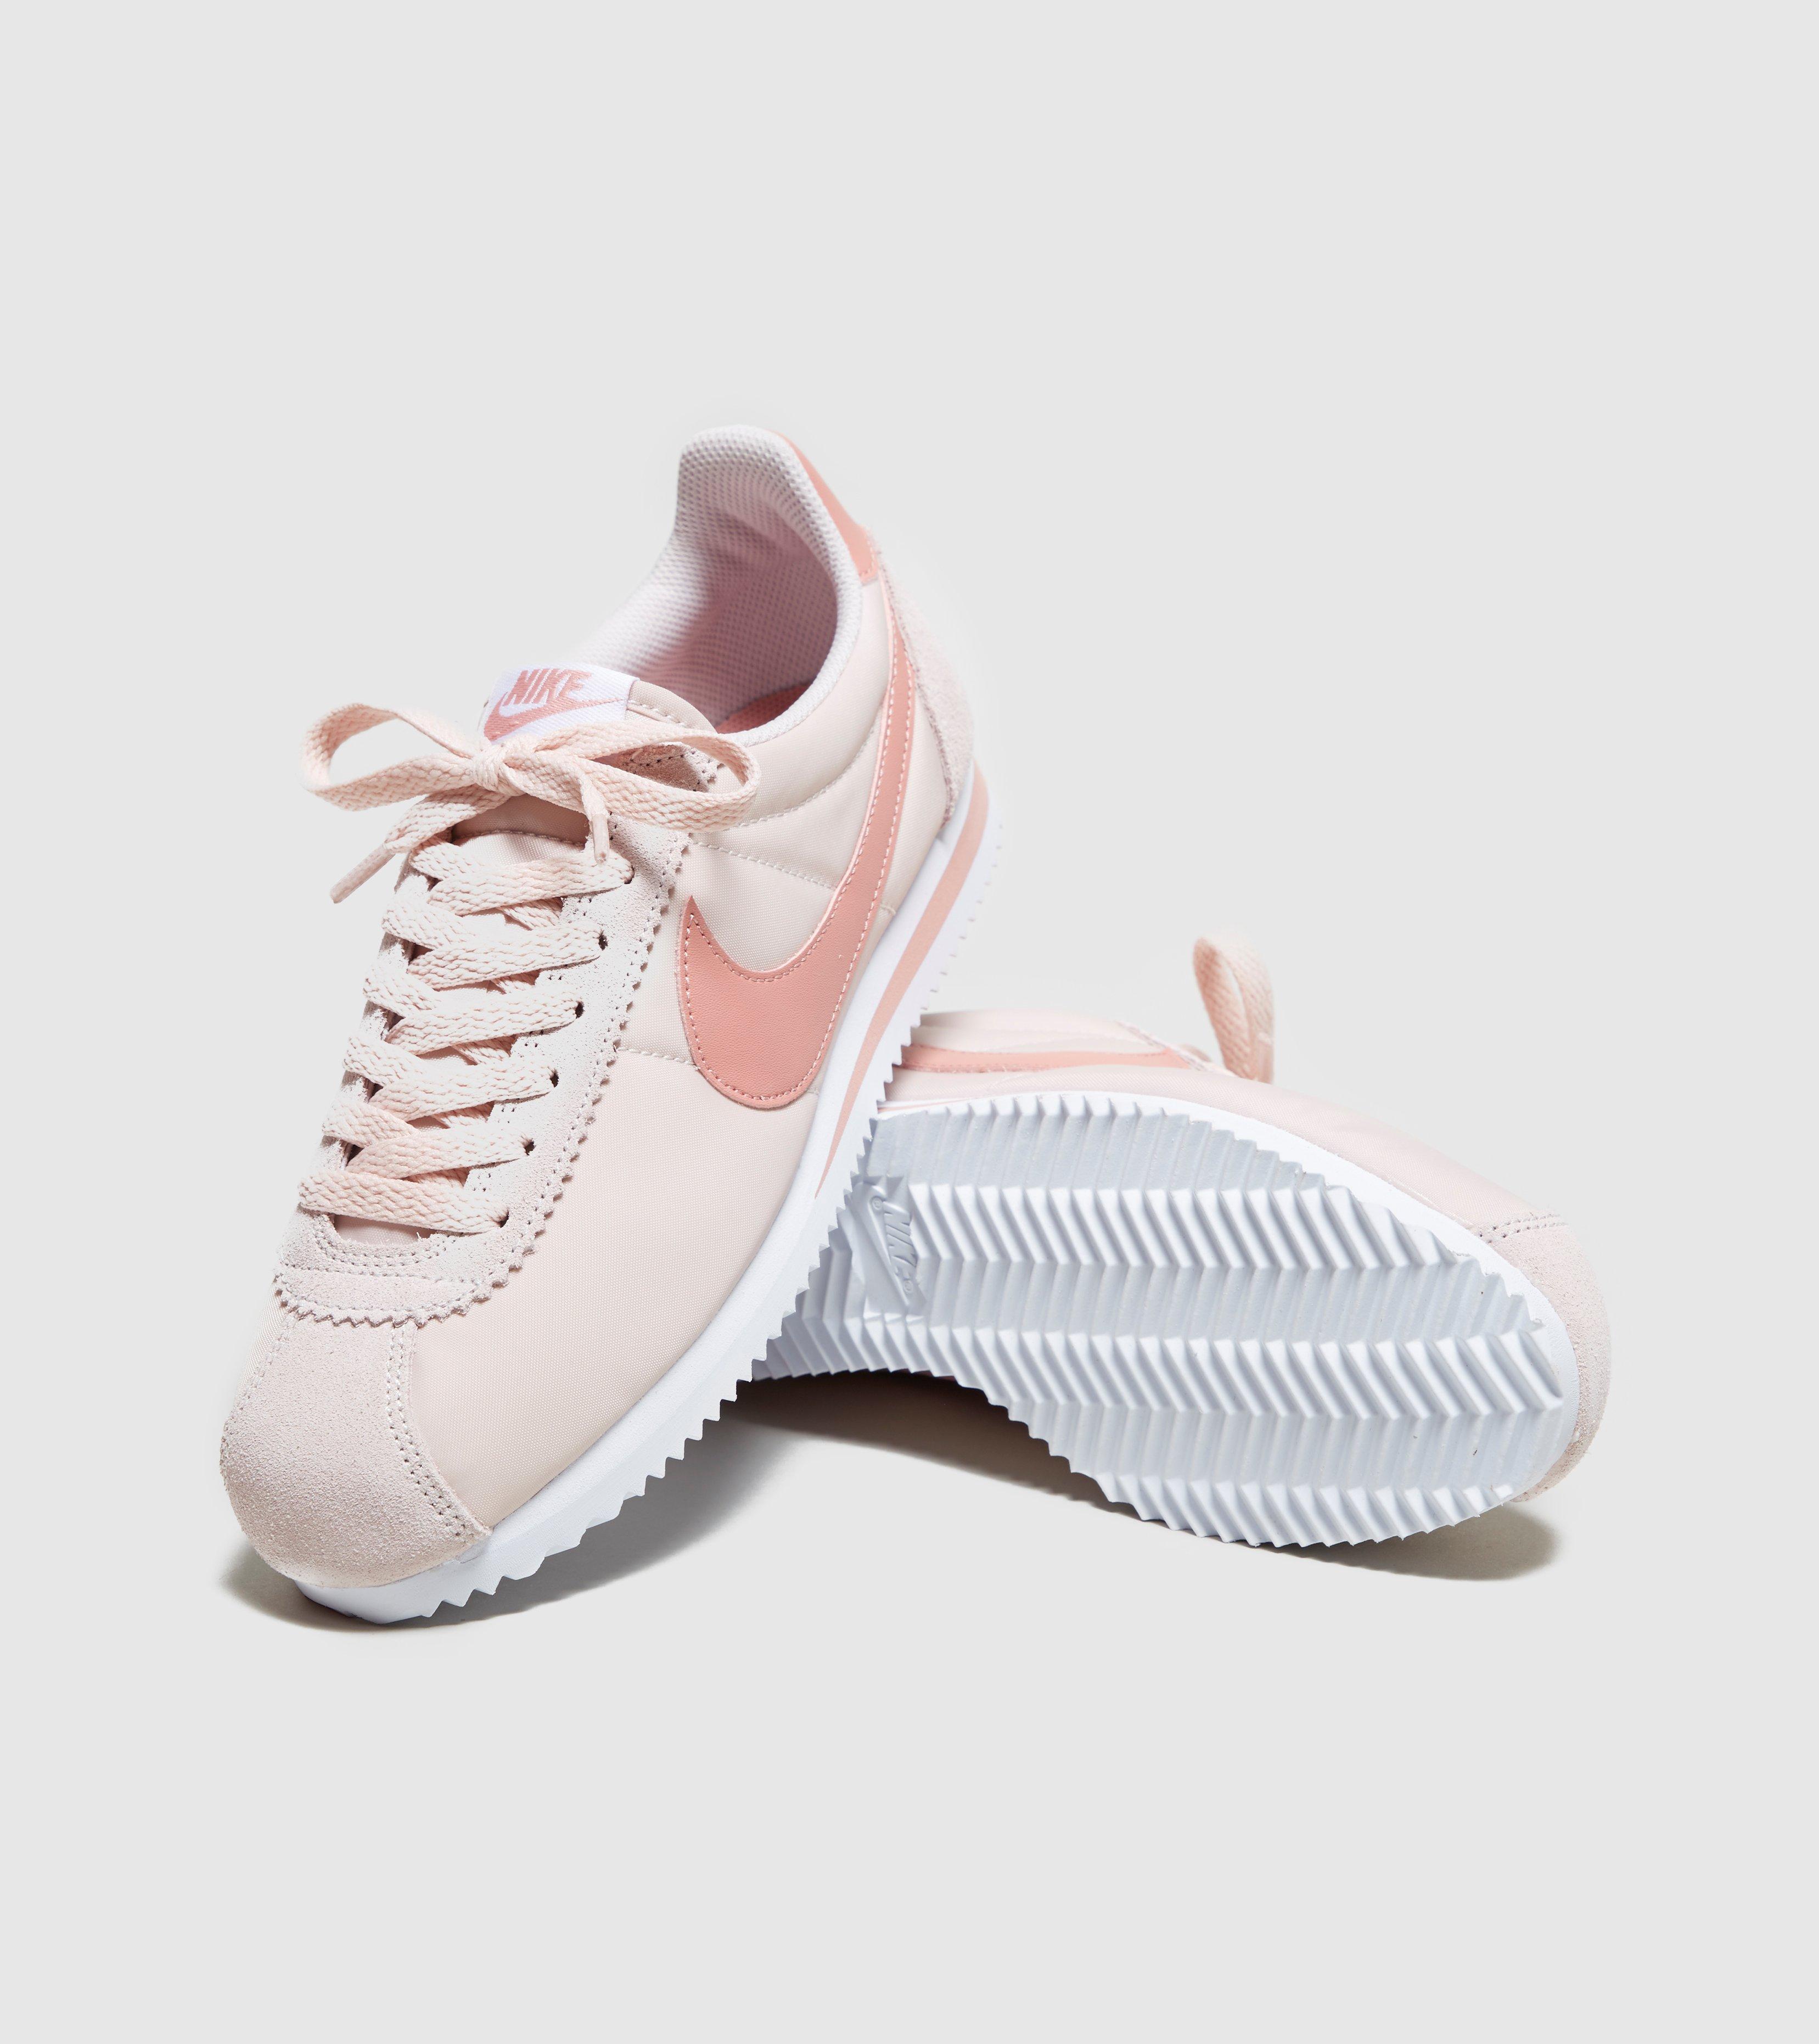 Lyst - Nike Classic Cortez Women s in Pink 31259d36782b